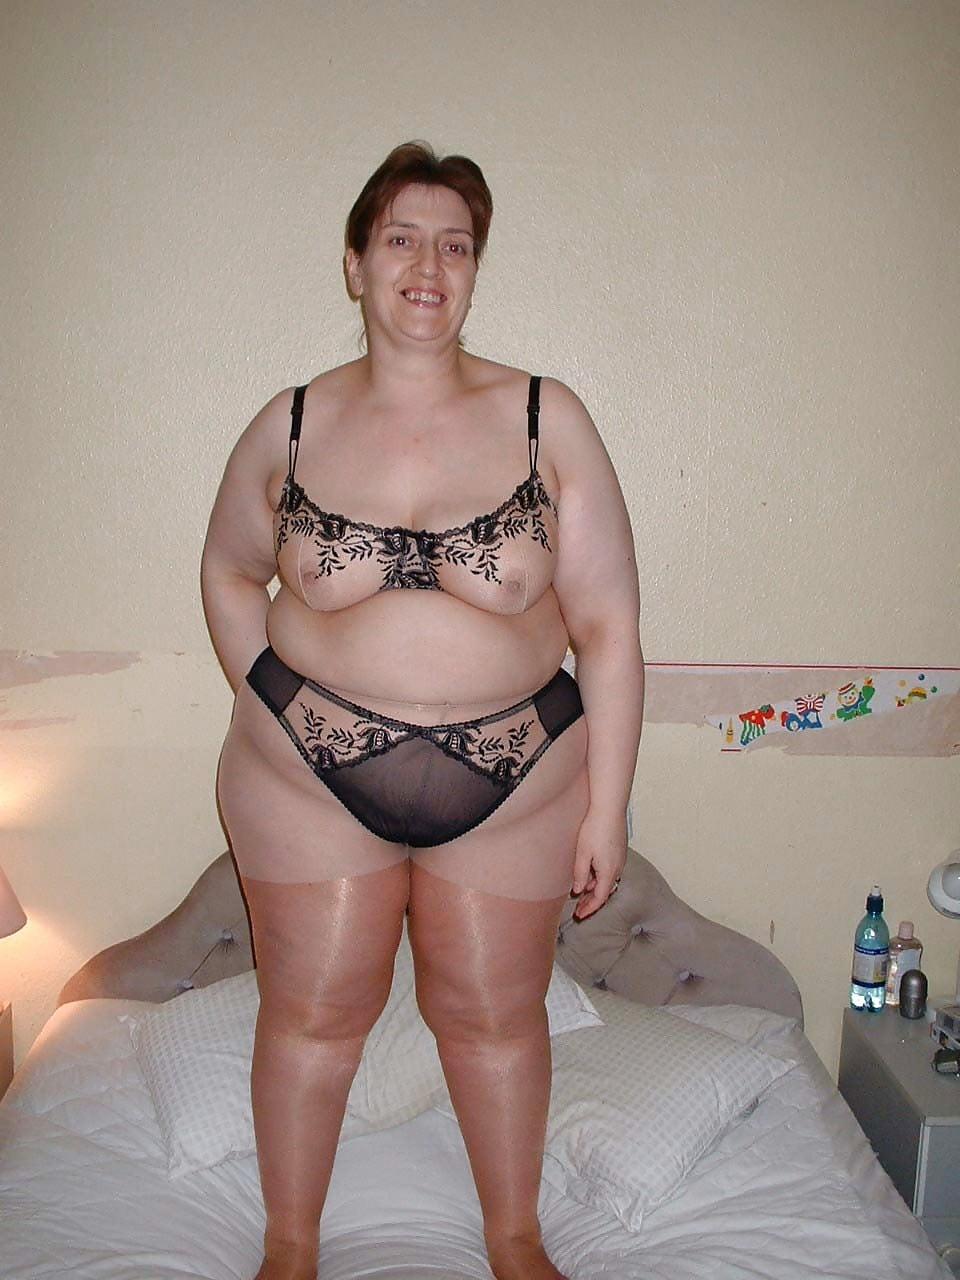 Perman Women Plus Size Lingerie, Lace Translucent Halter Open Back Babydoll Mini Dresses Sleepwear Lingerie